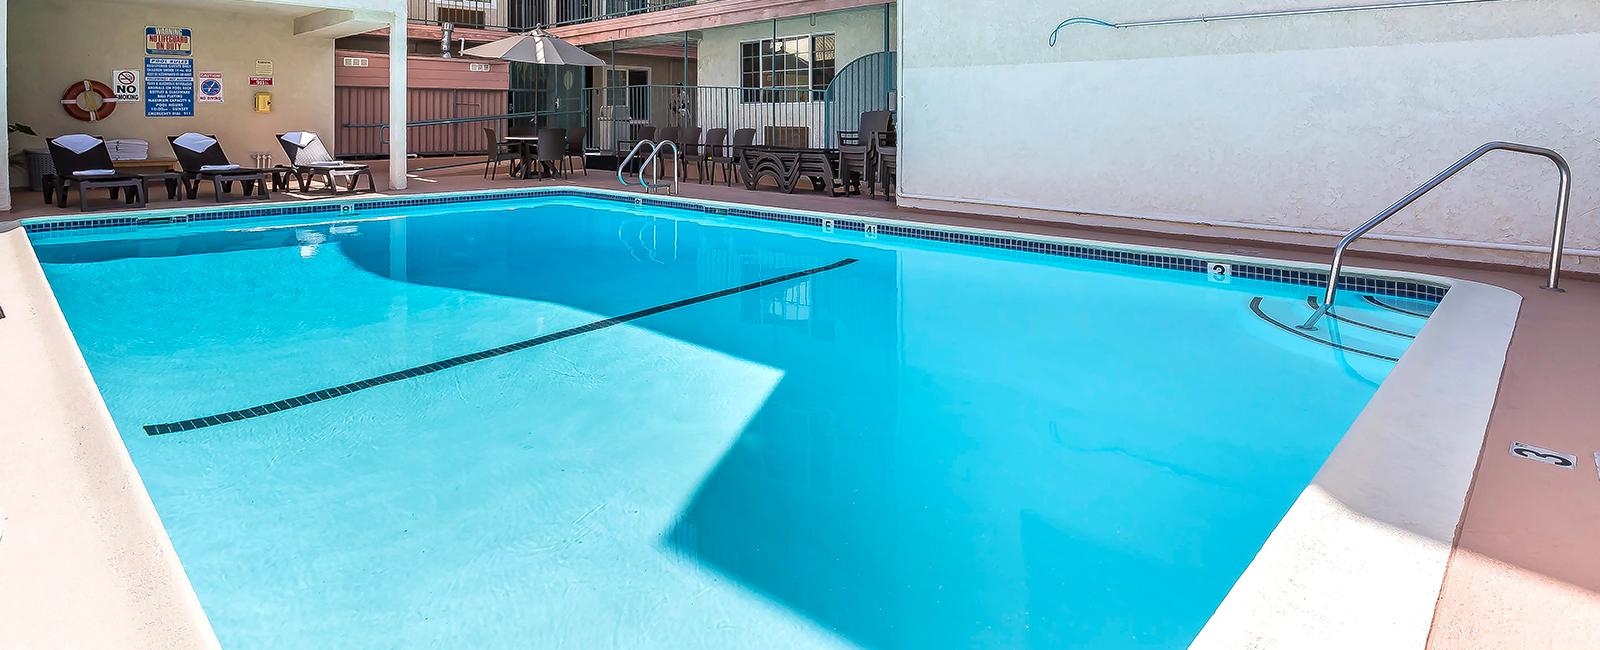 Santa Monica Hotel With Pool Comfort Inn Santa Monica